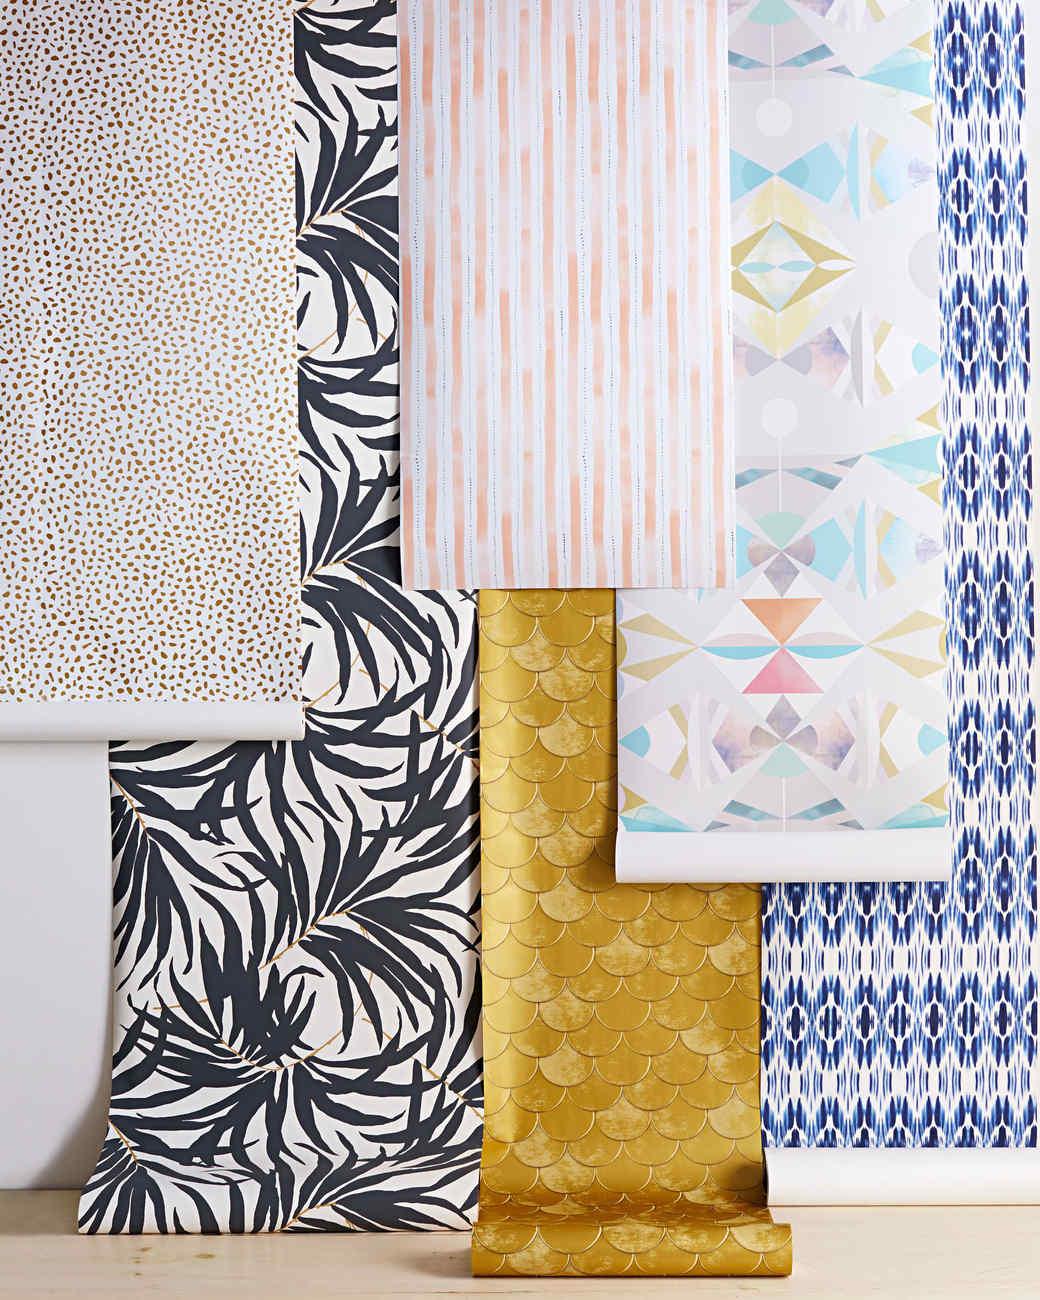 peel off wallpaper samples - How To Remove Wallpaper Easily